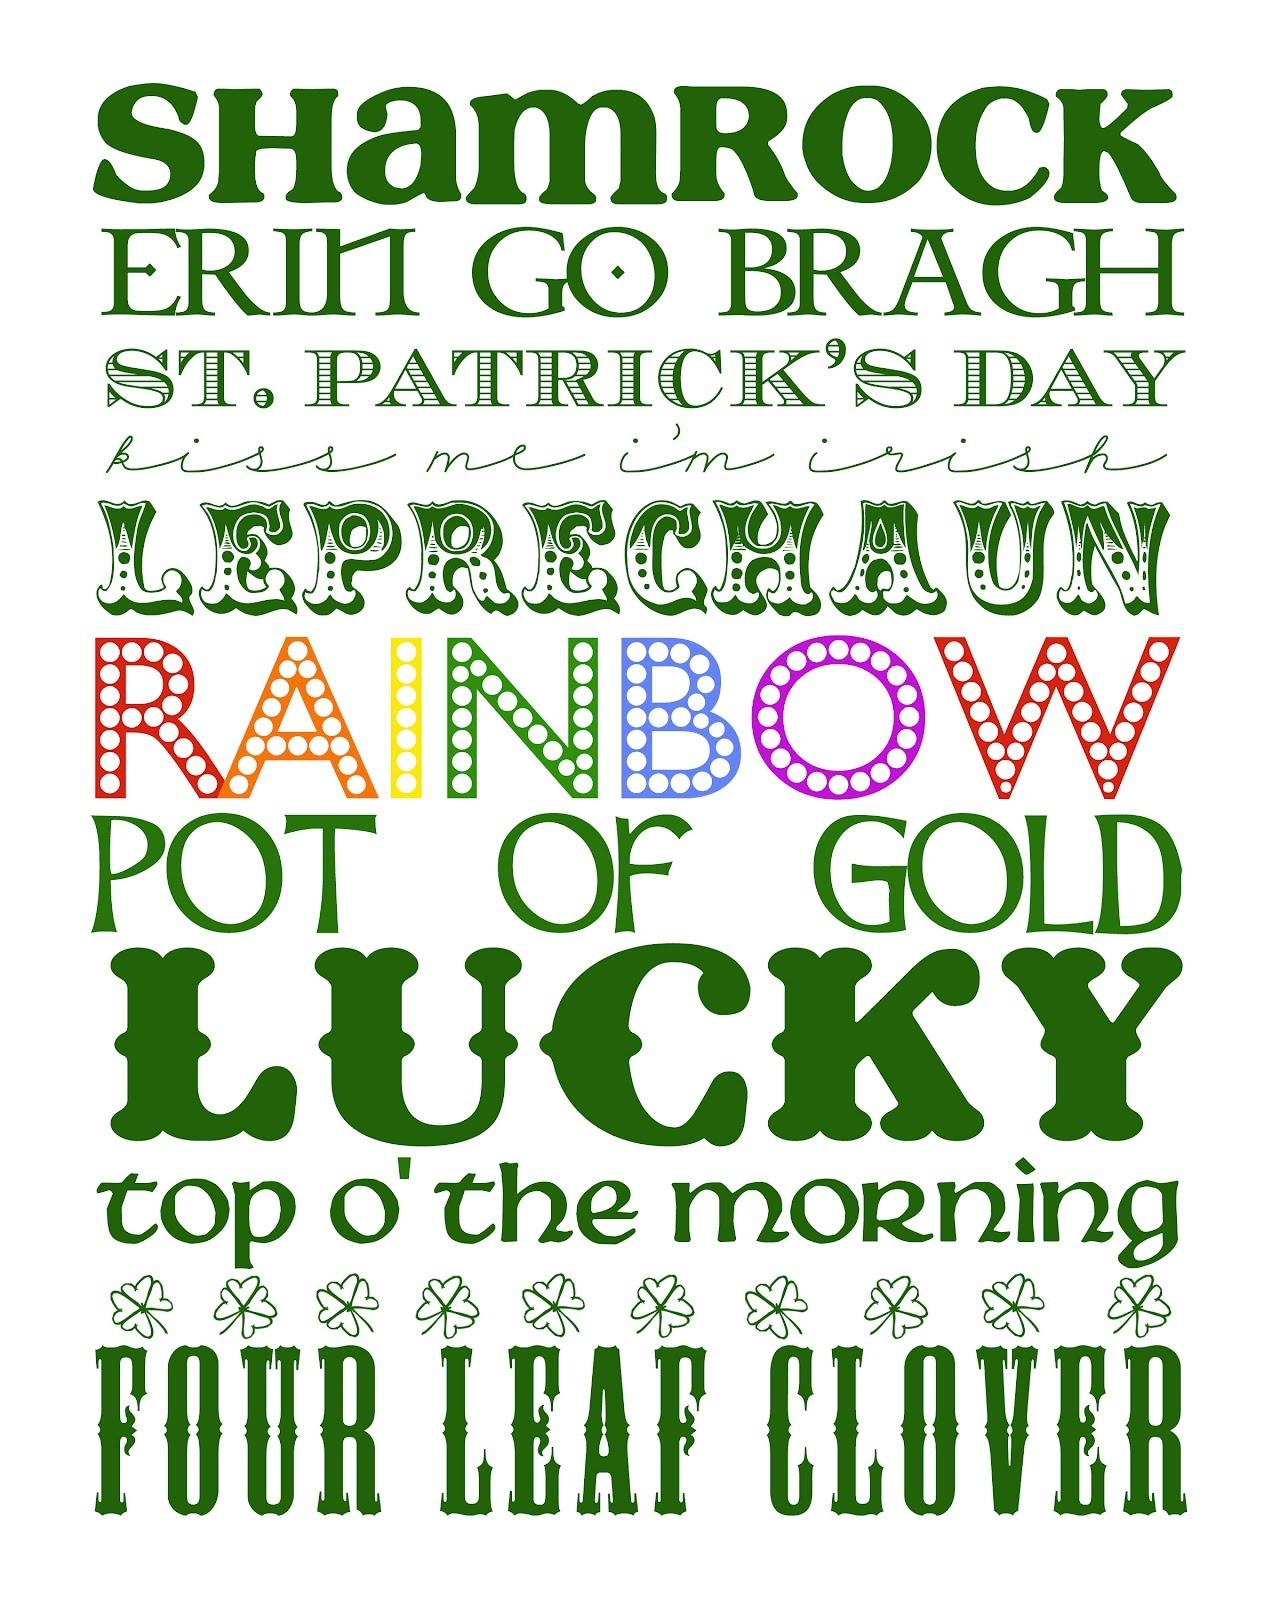 Funky Polkadot Giraffe: {Lucky} Stuff: St. Patrick's Day Subway Art - Free St Patrick's Day Subway Art Printables